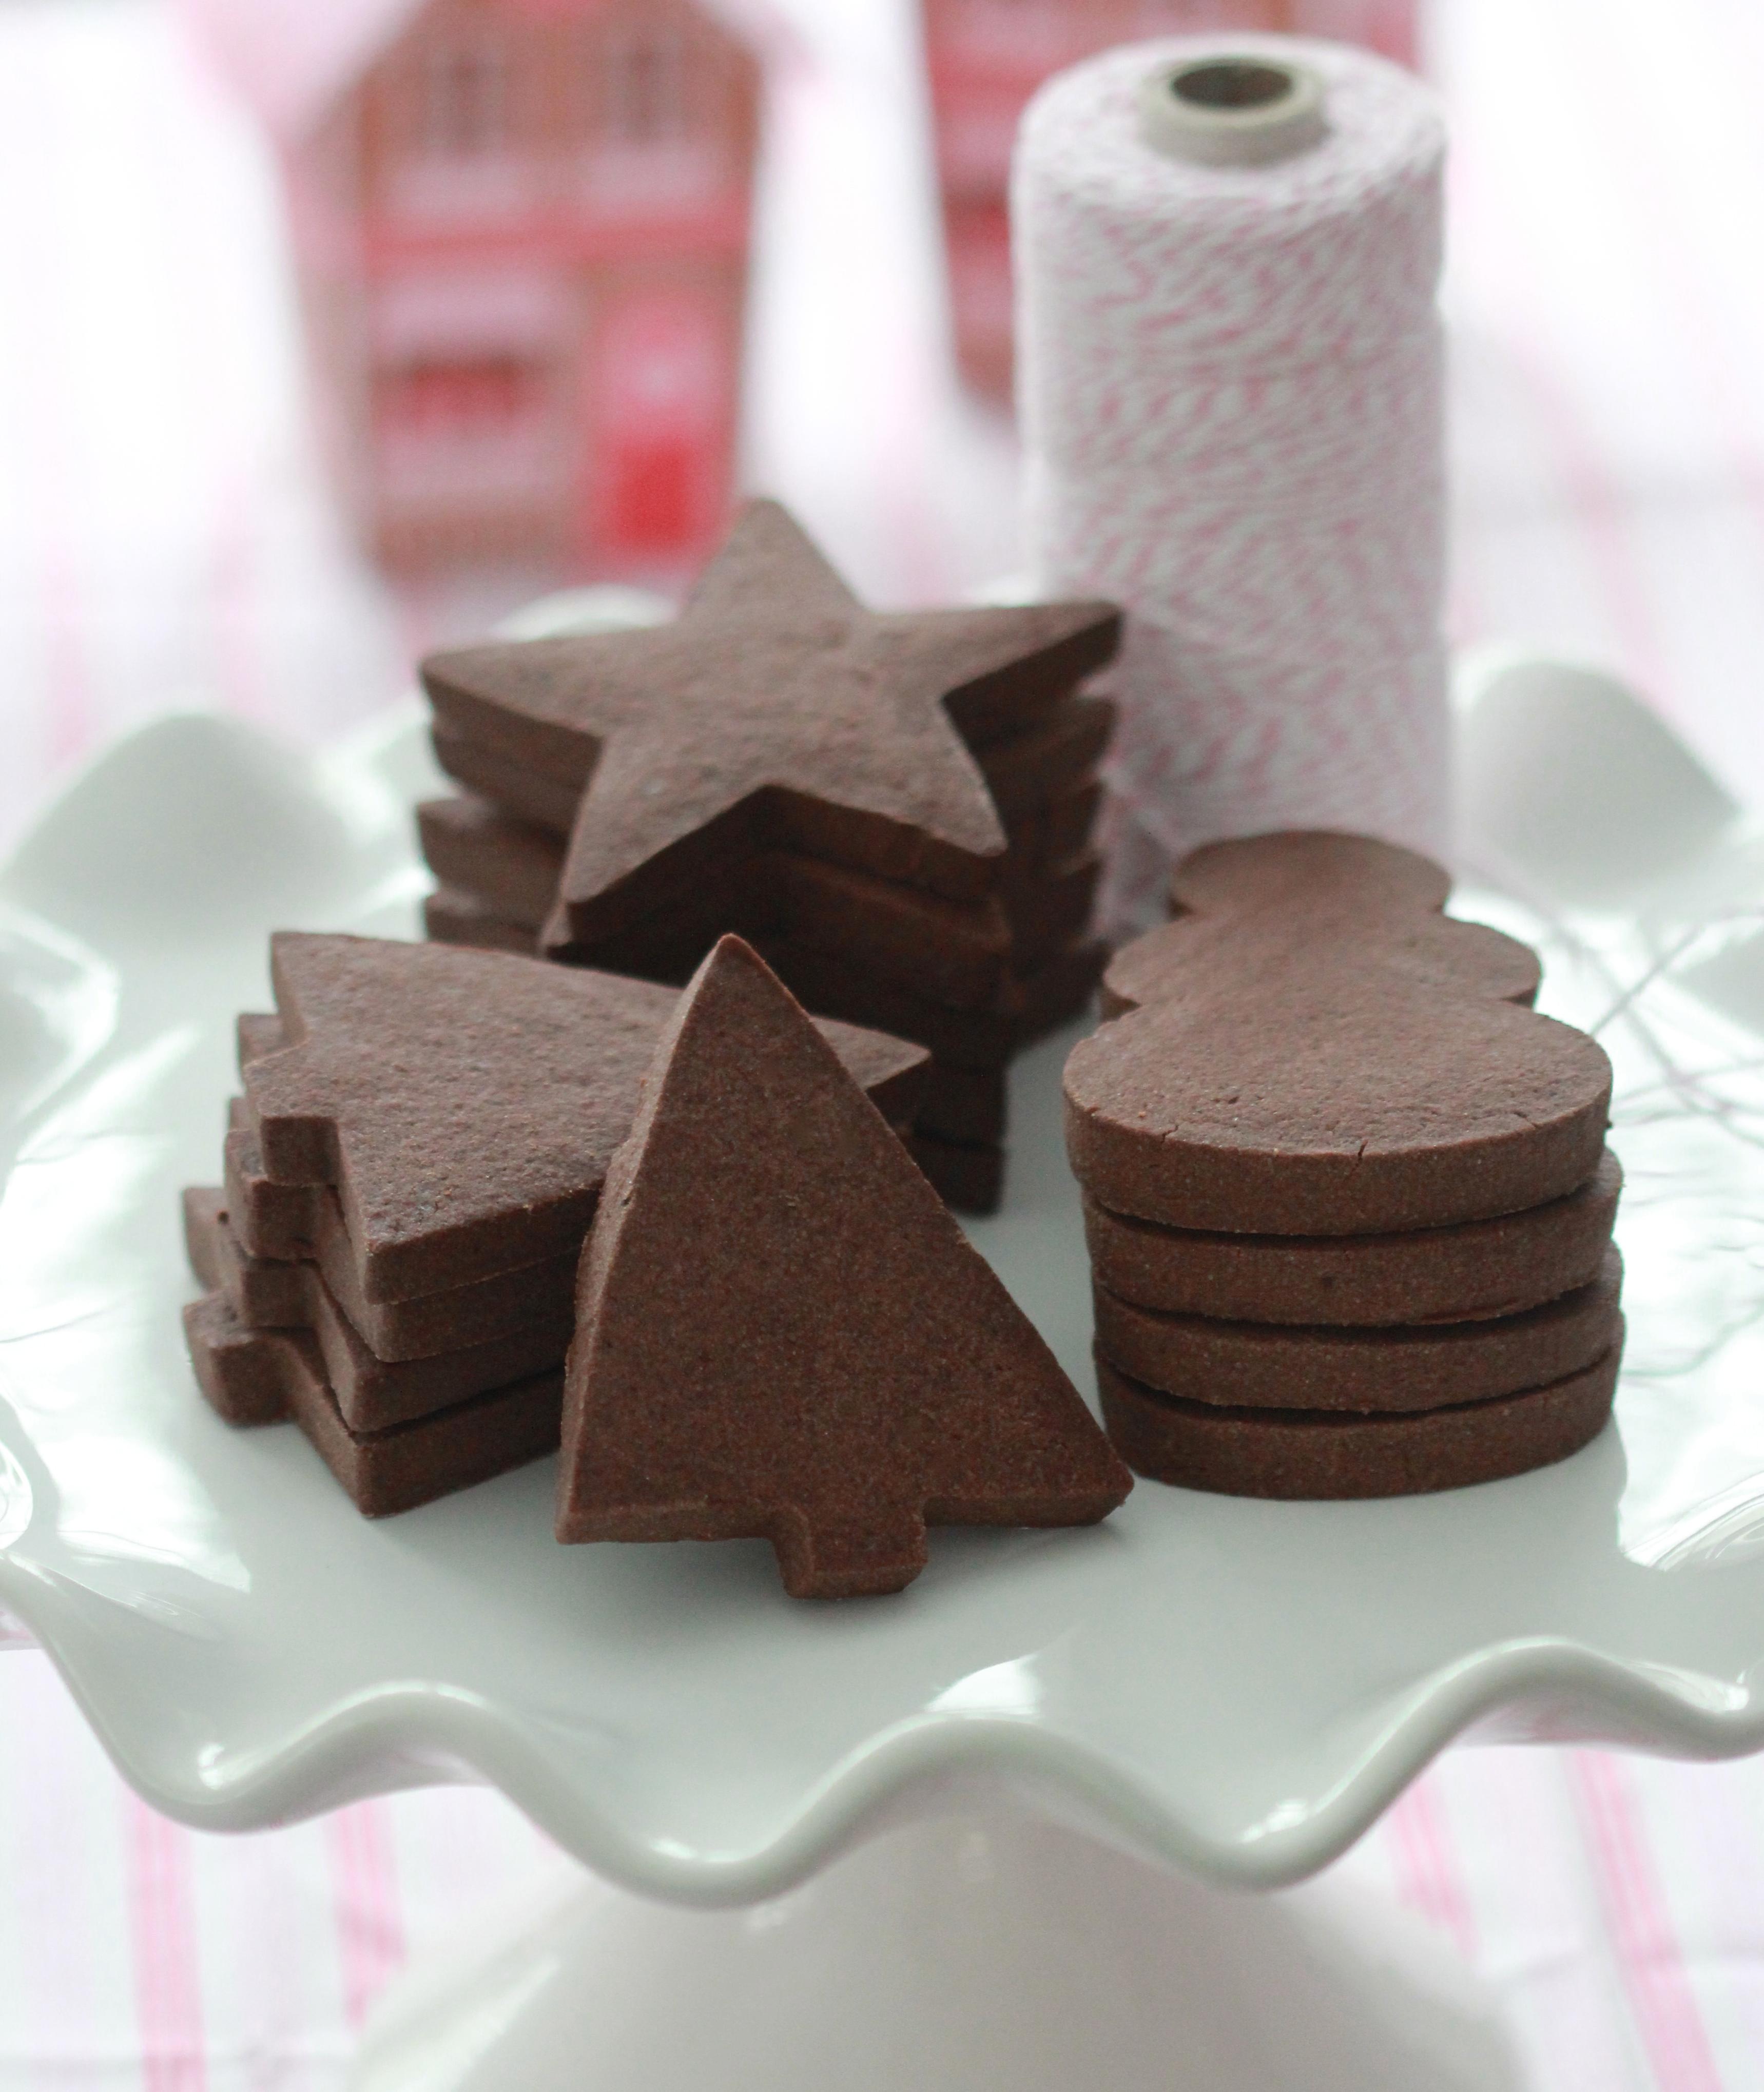 Chocolate Sugar Cookie Recipe